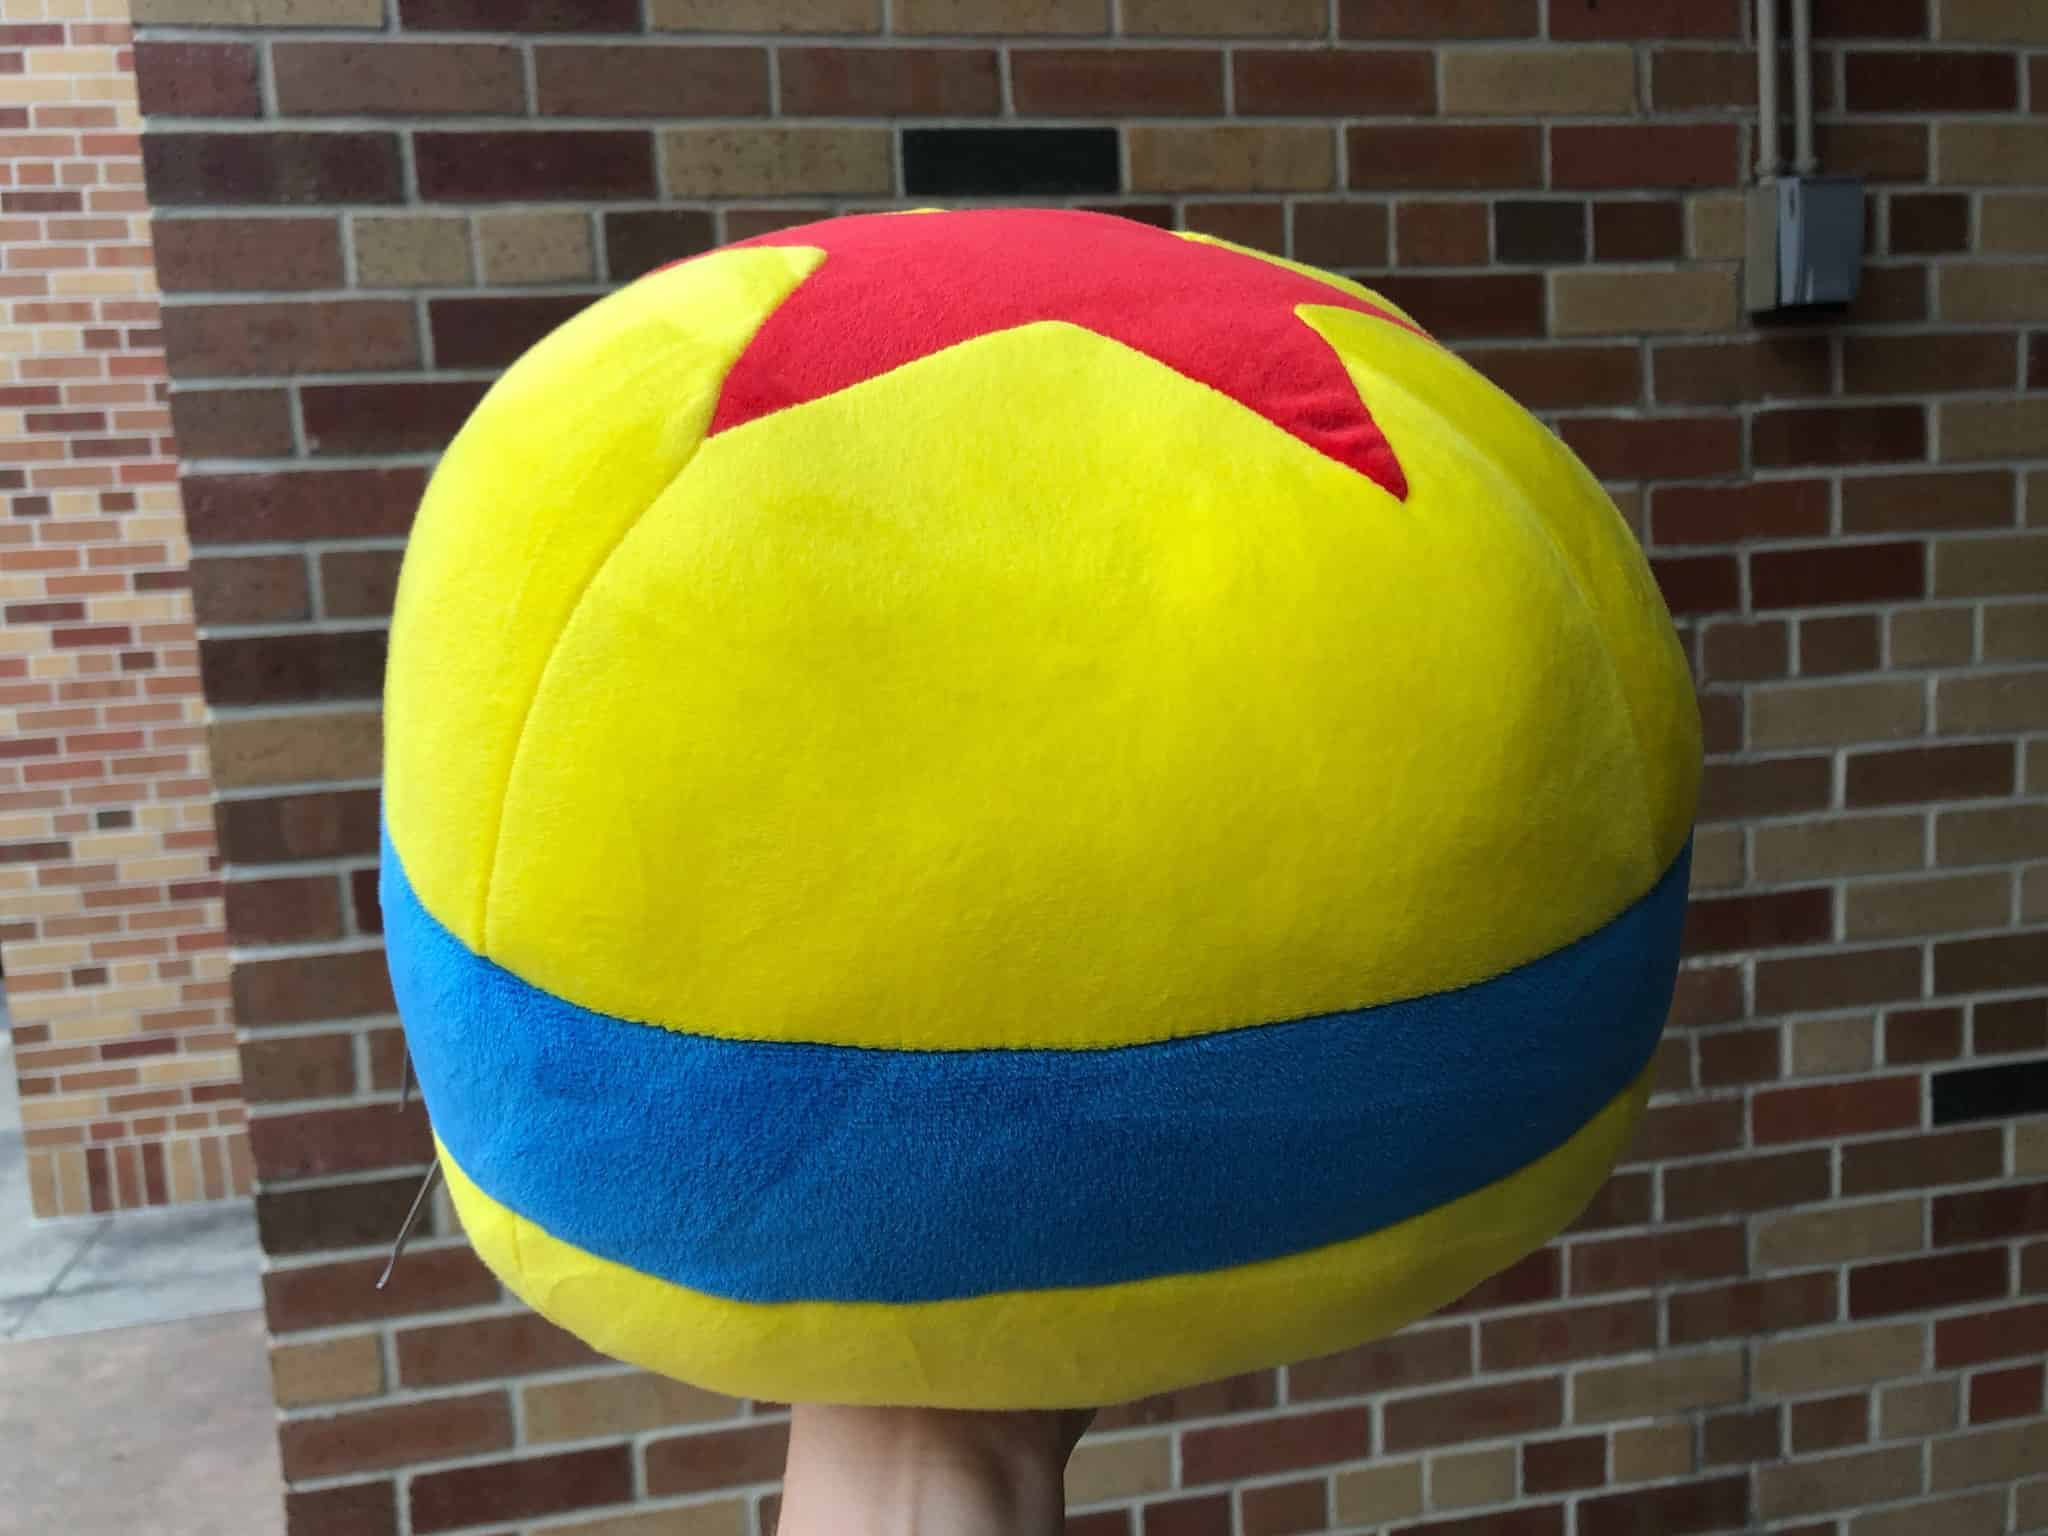 new pixar luxo ball plush pillow for